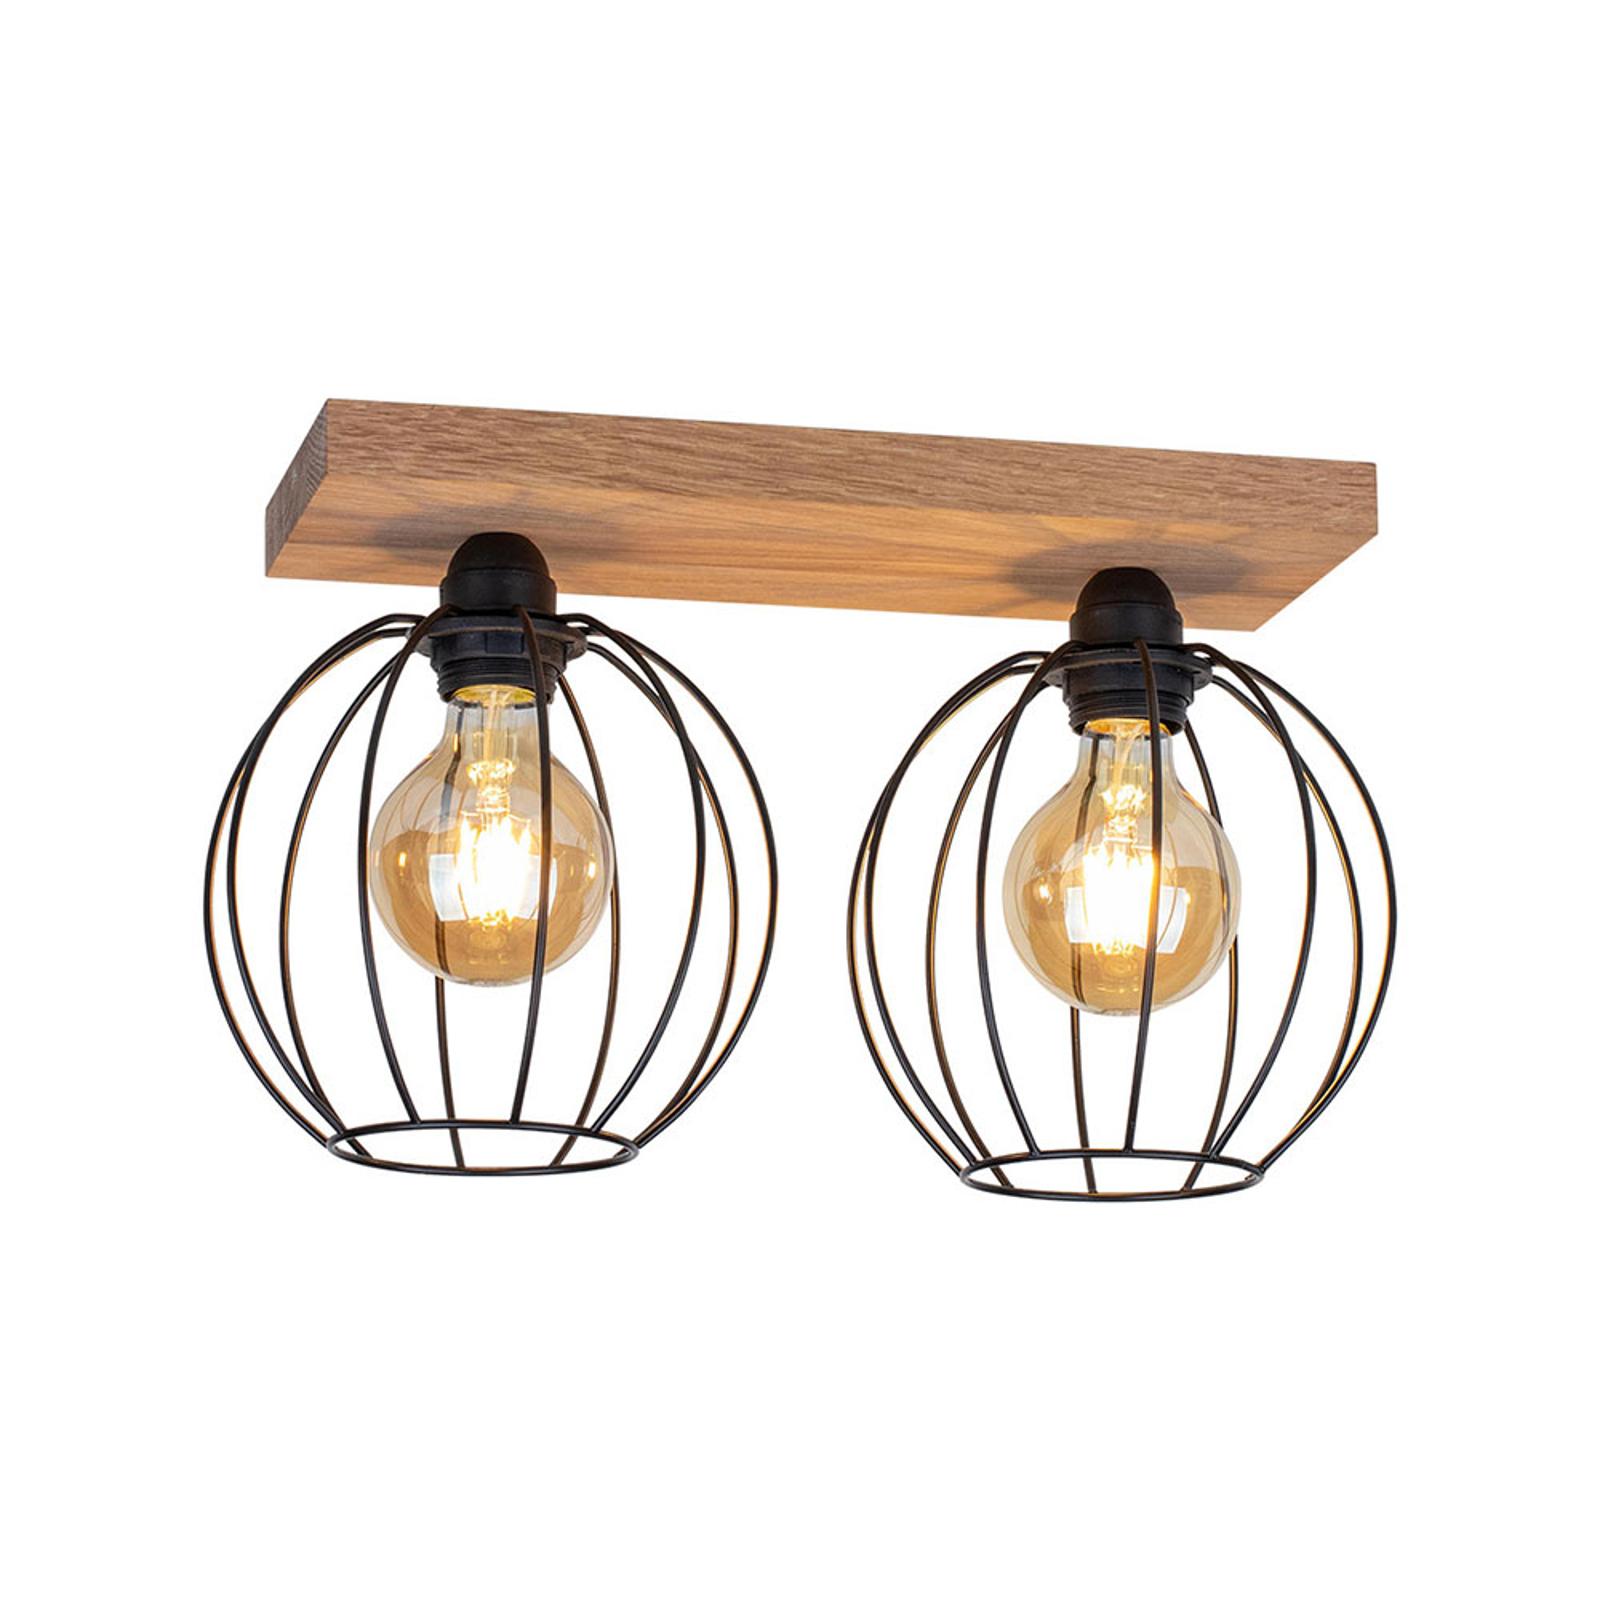 Plafonnier Dorett, chêne, à 2 lampes